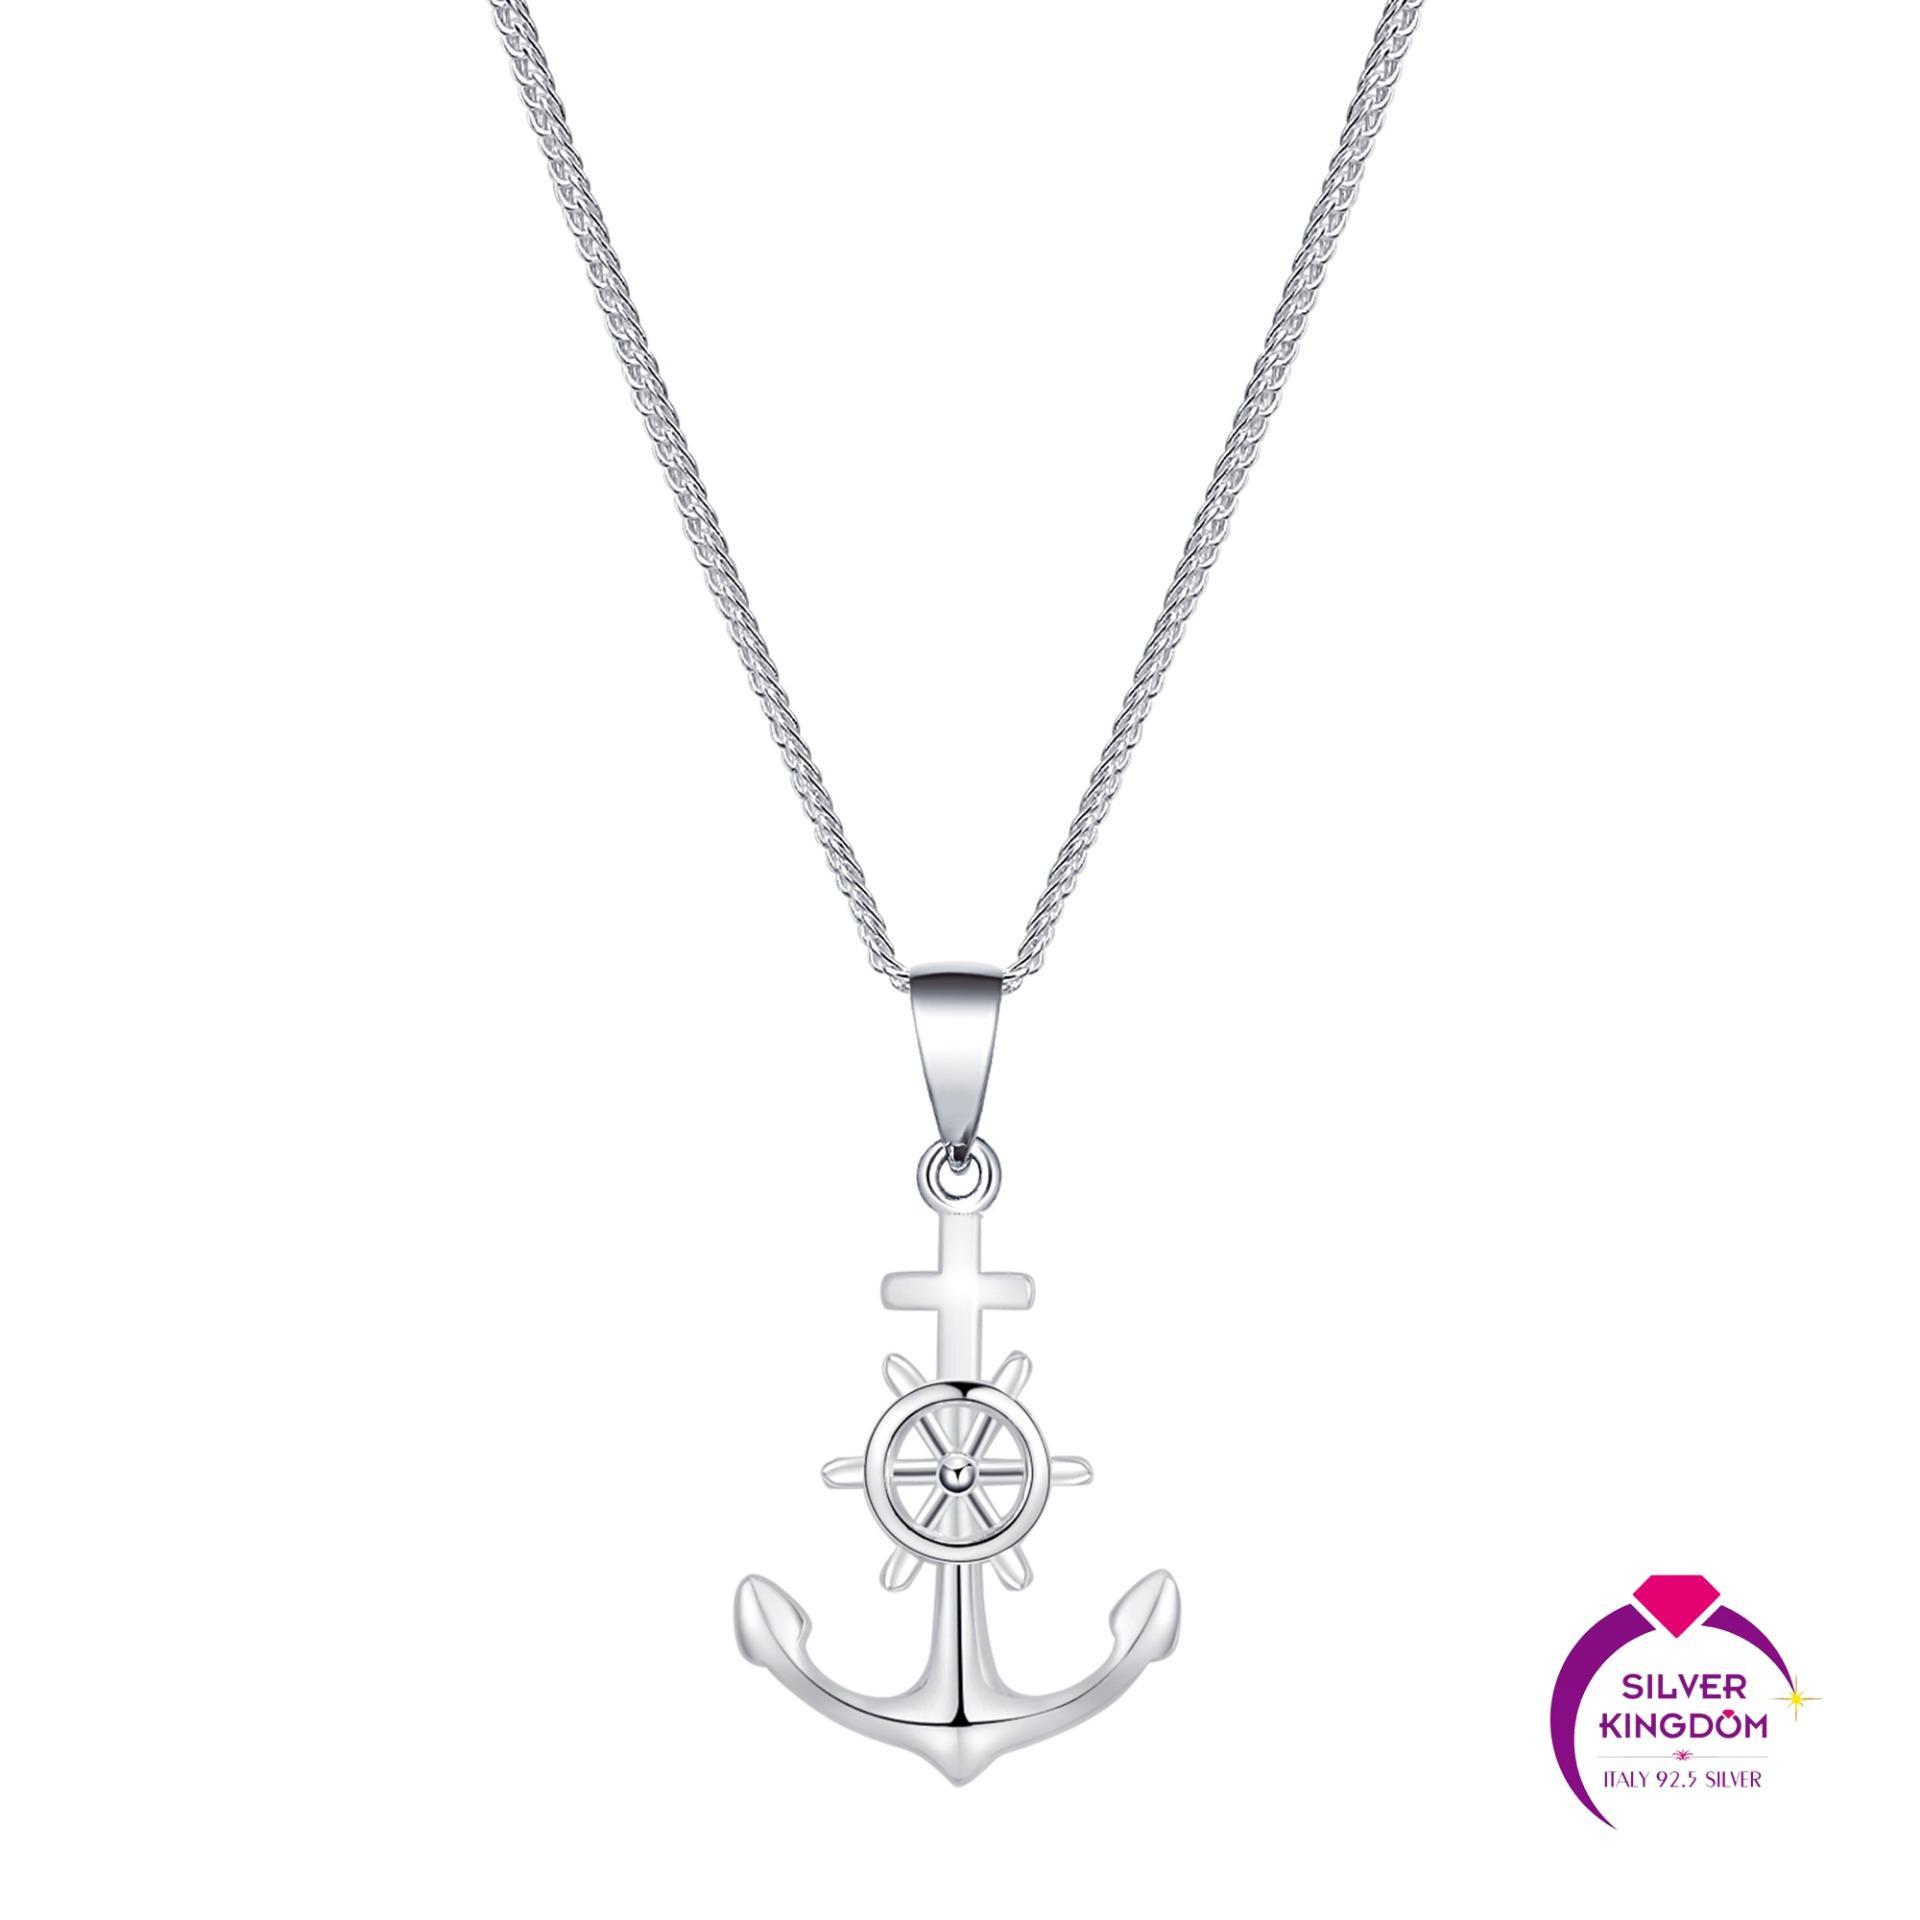 98ae6ef019c3 Necklace For Men Mens Brands S. P315sc Mens Sterling Silver 925 Simple  Cross Pendant ...